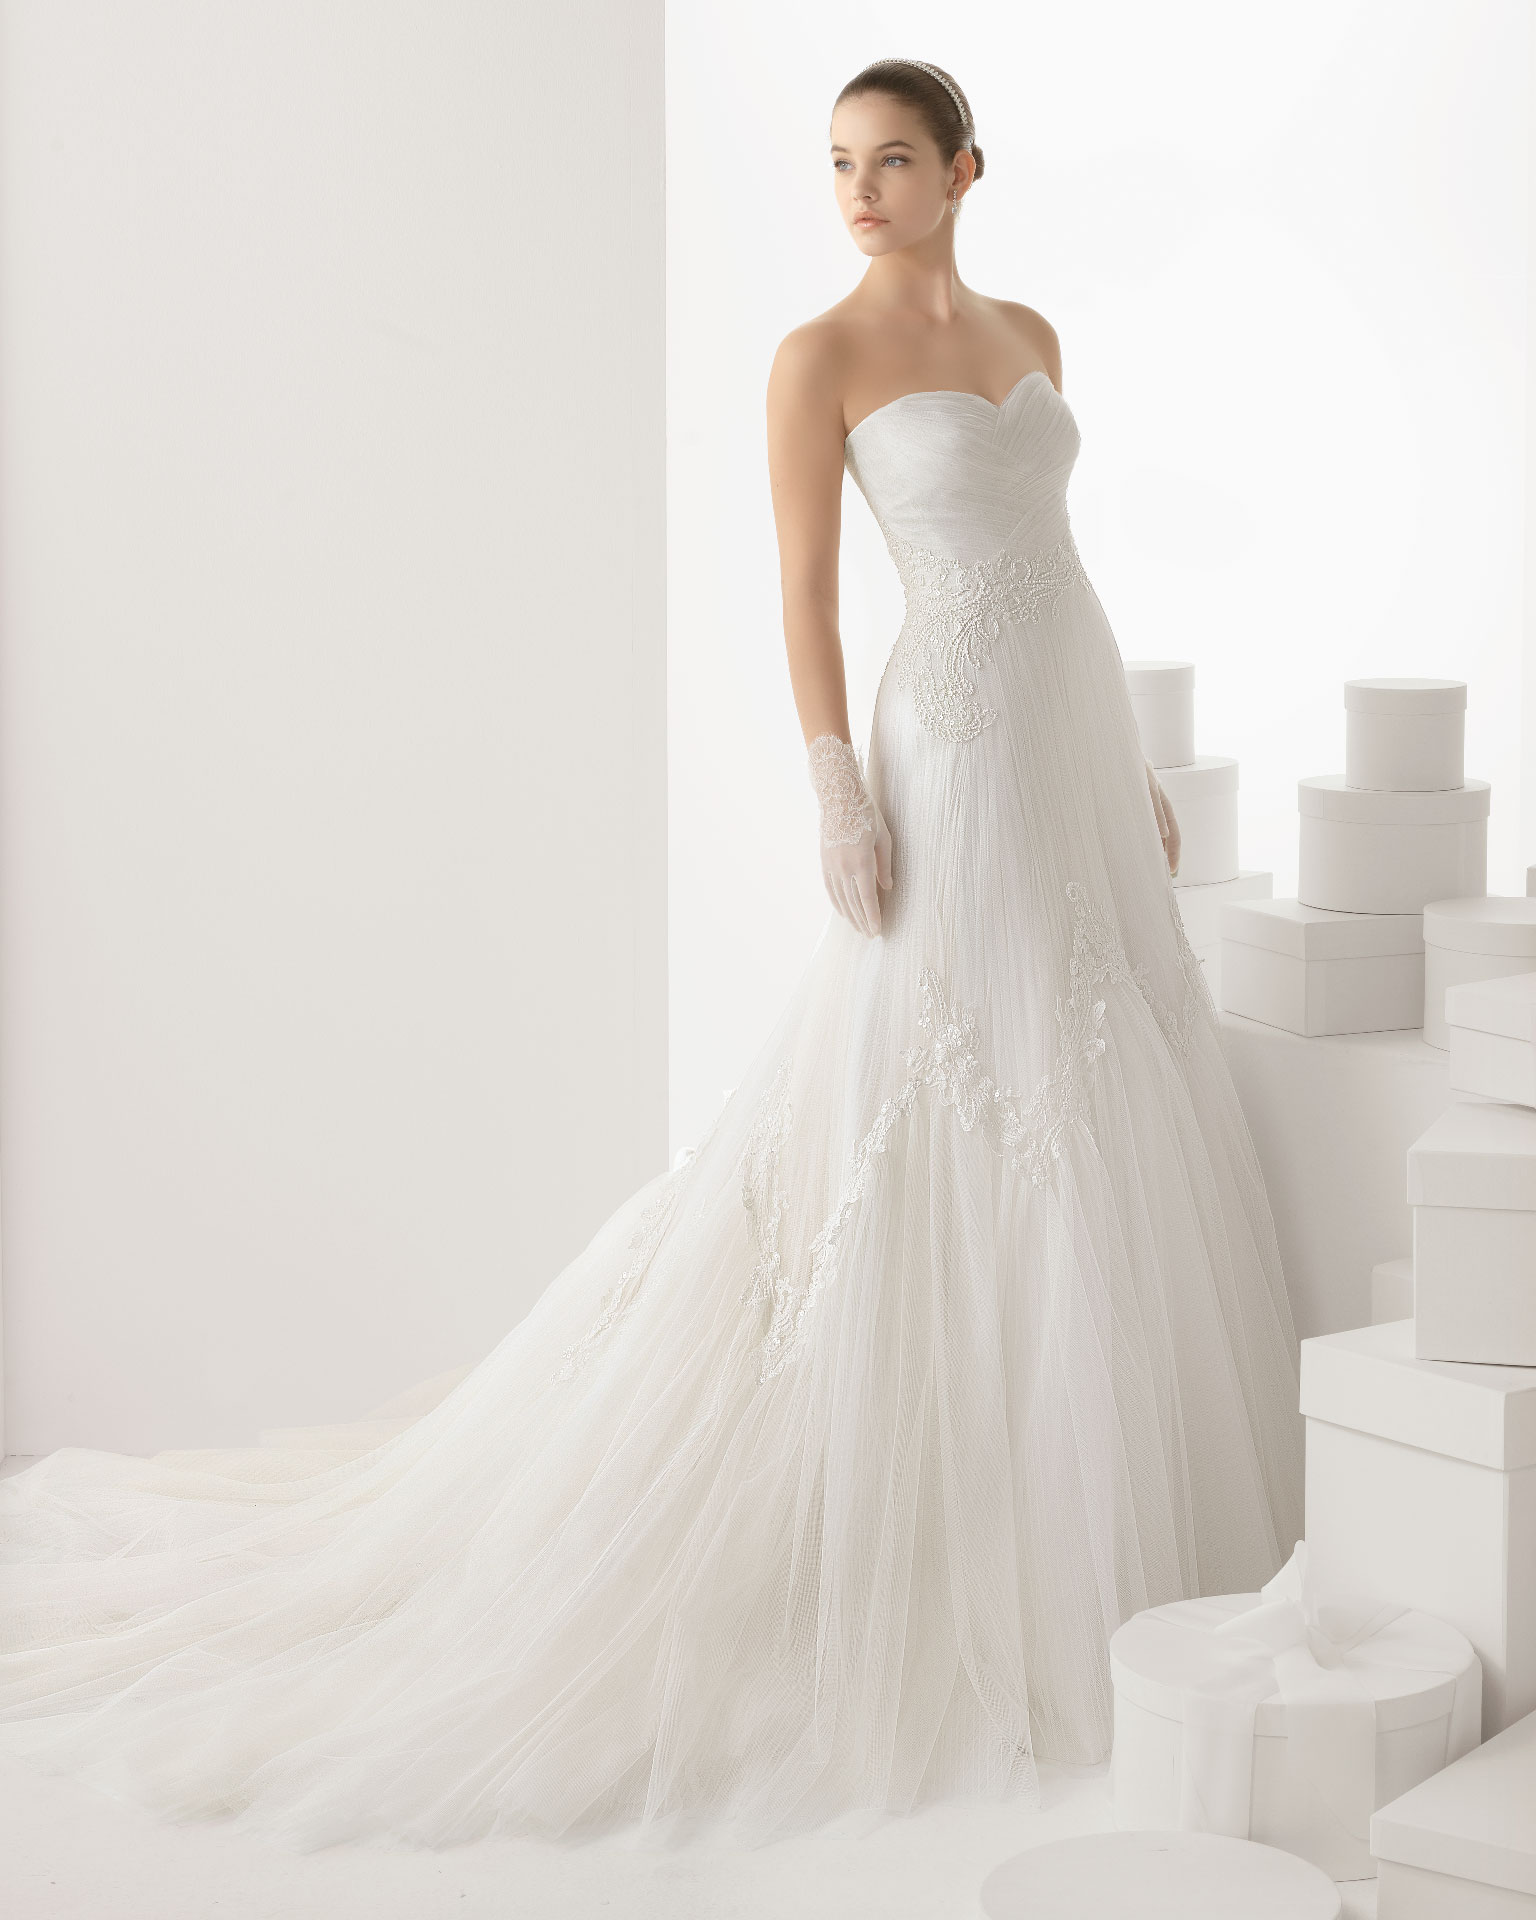 Rosa clara wedding dress 2014 bridal carlota for Rosa clara wedding dresses